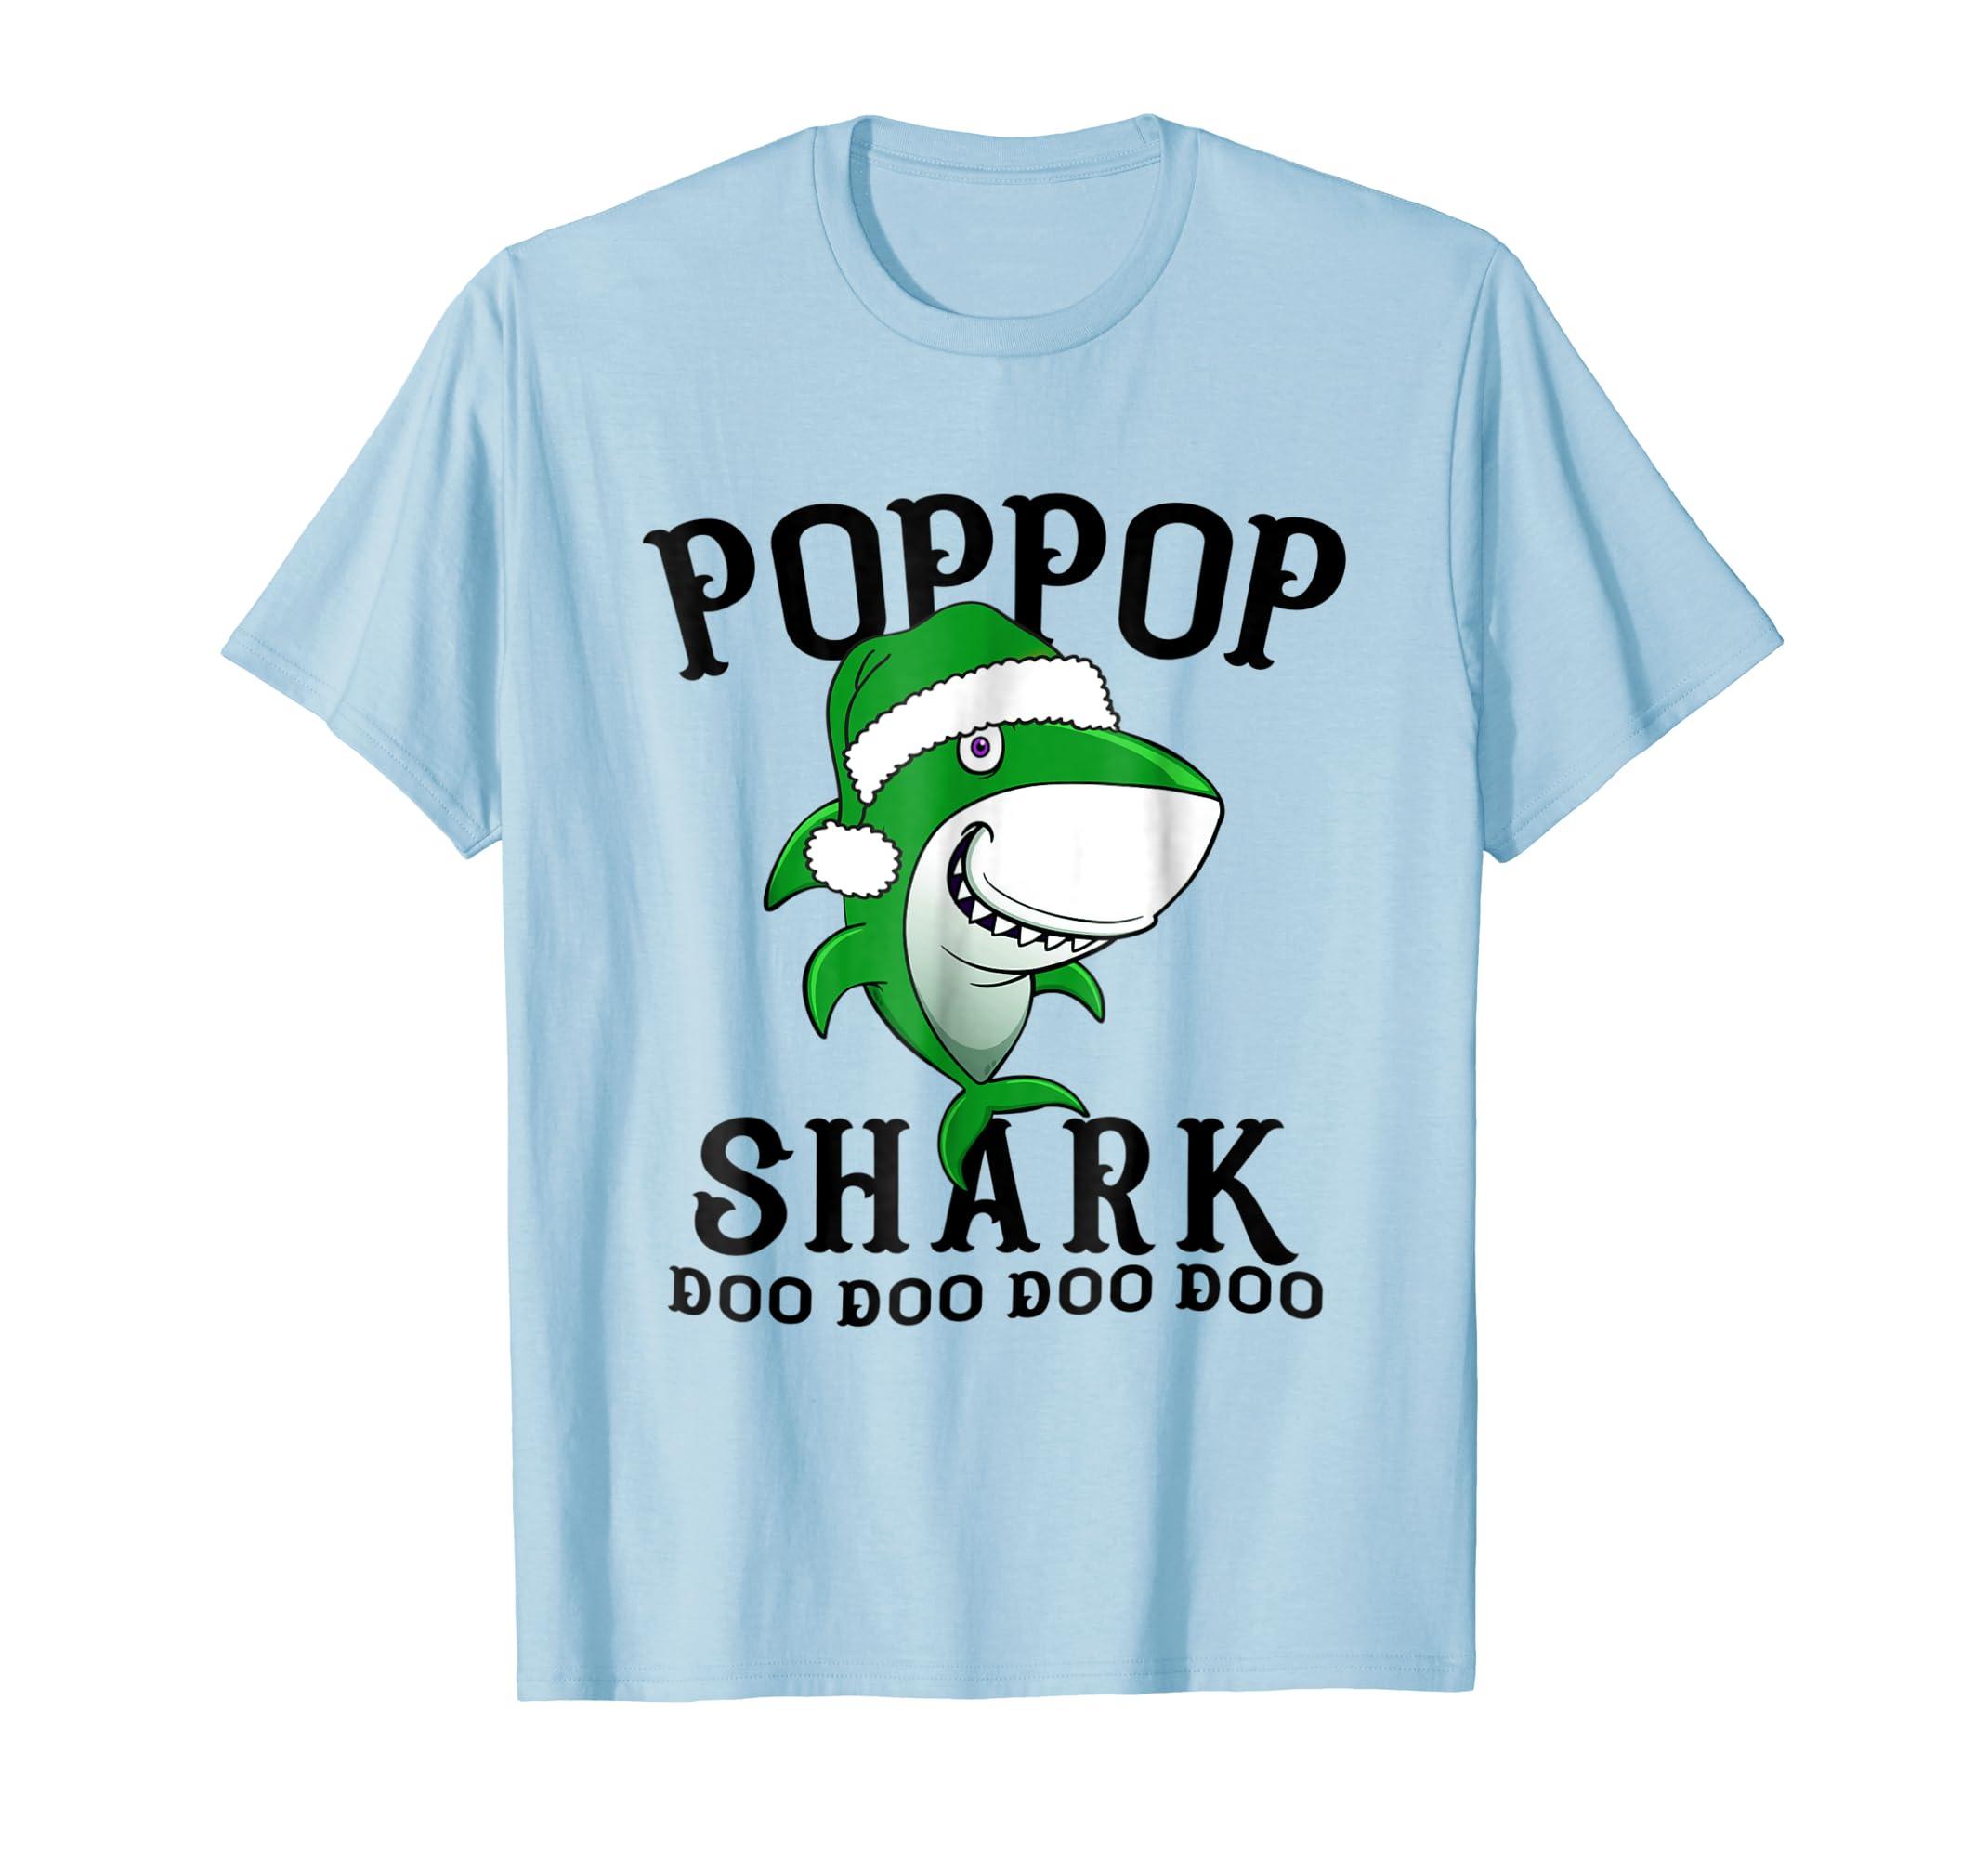 Poppop Shark T Shirt Grandma Grandpa Halloween Christmas-Bawle